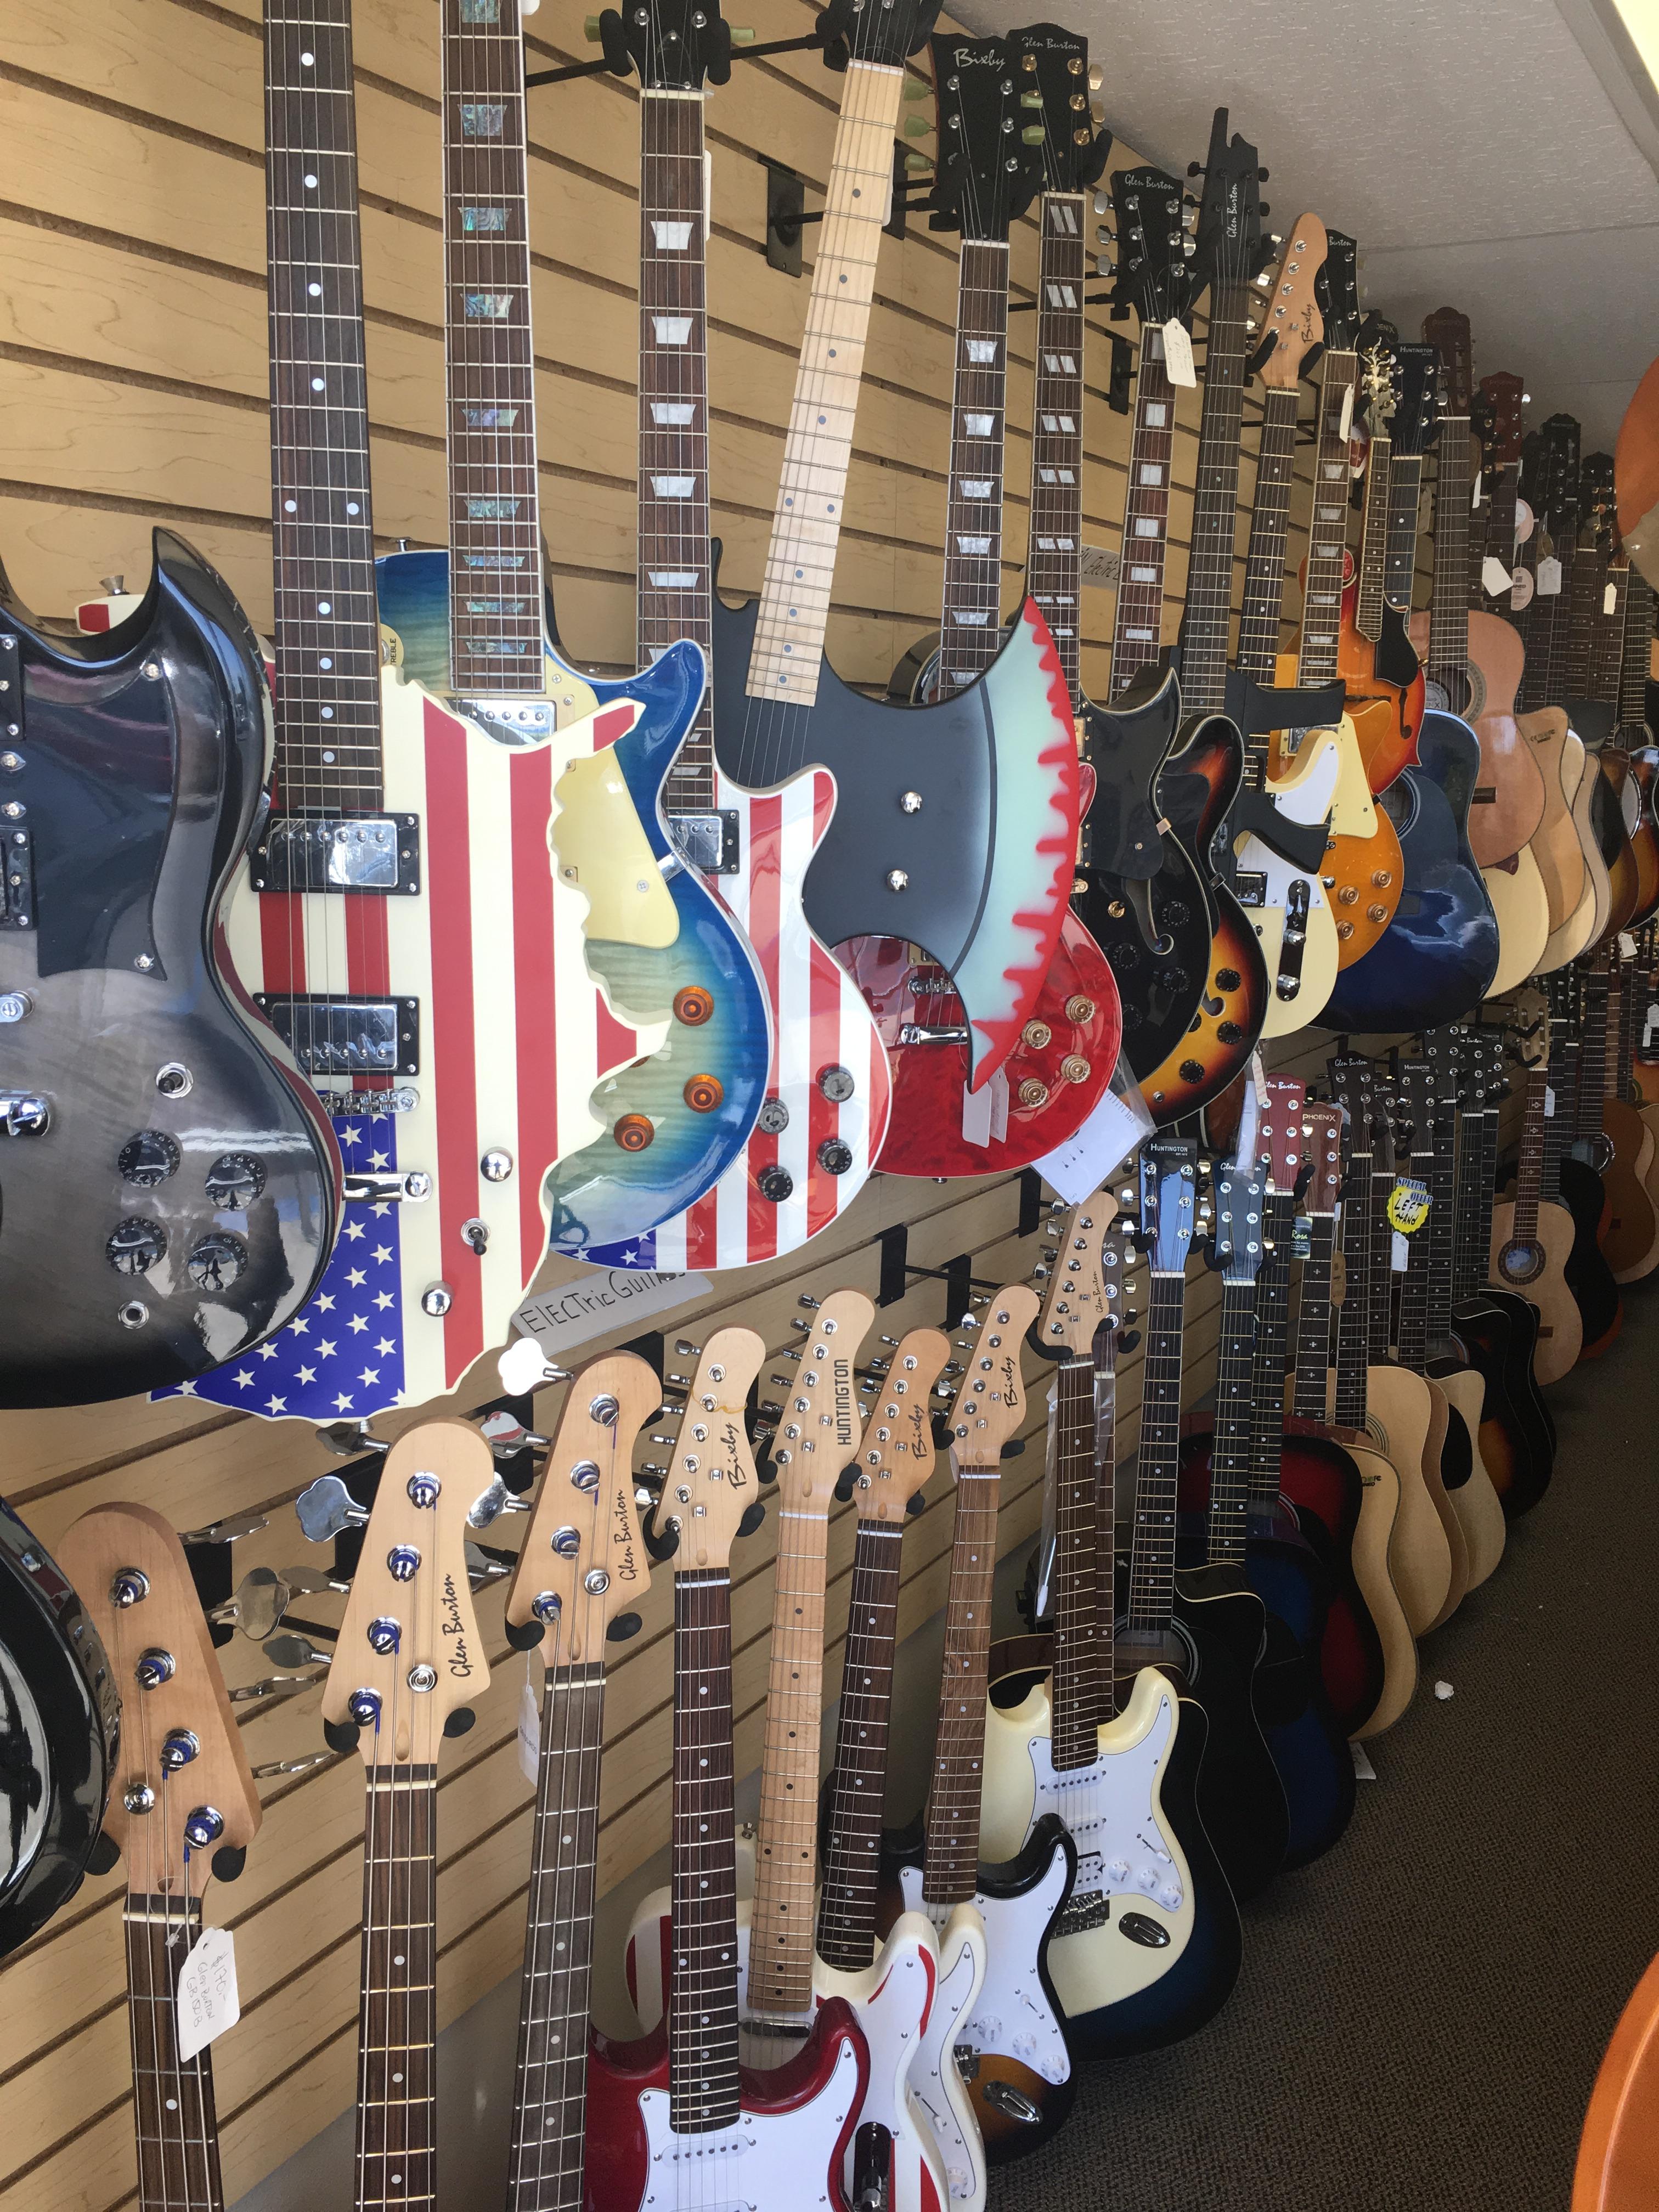 U.S. Music Store image 3